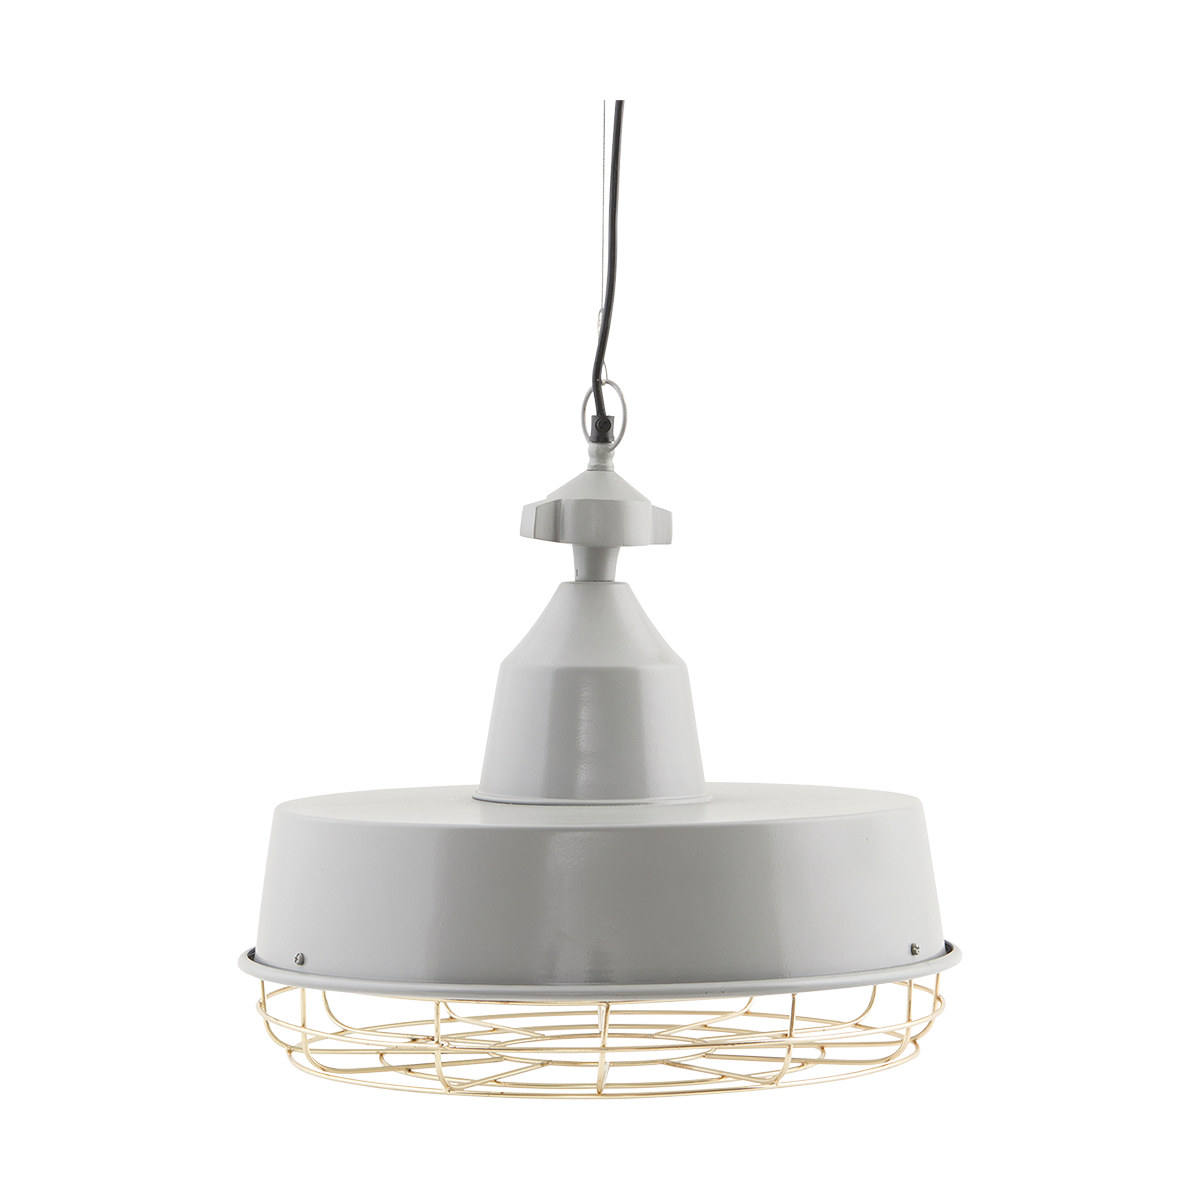 Gasby Lampa Grå/Mässing 40 cm